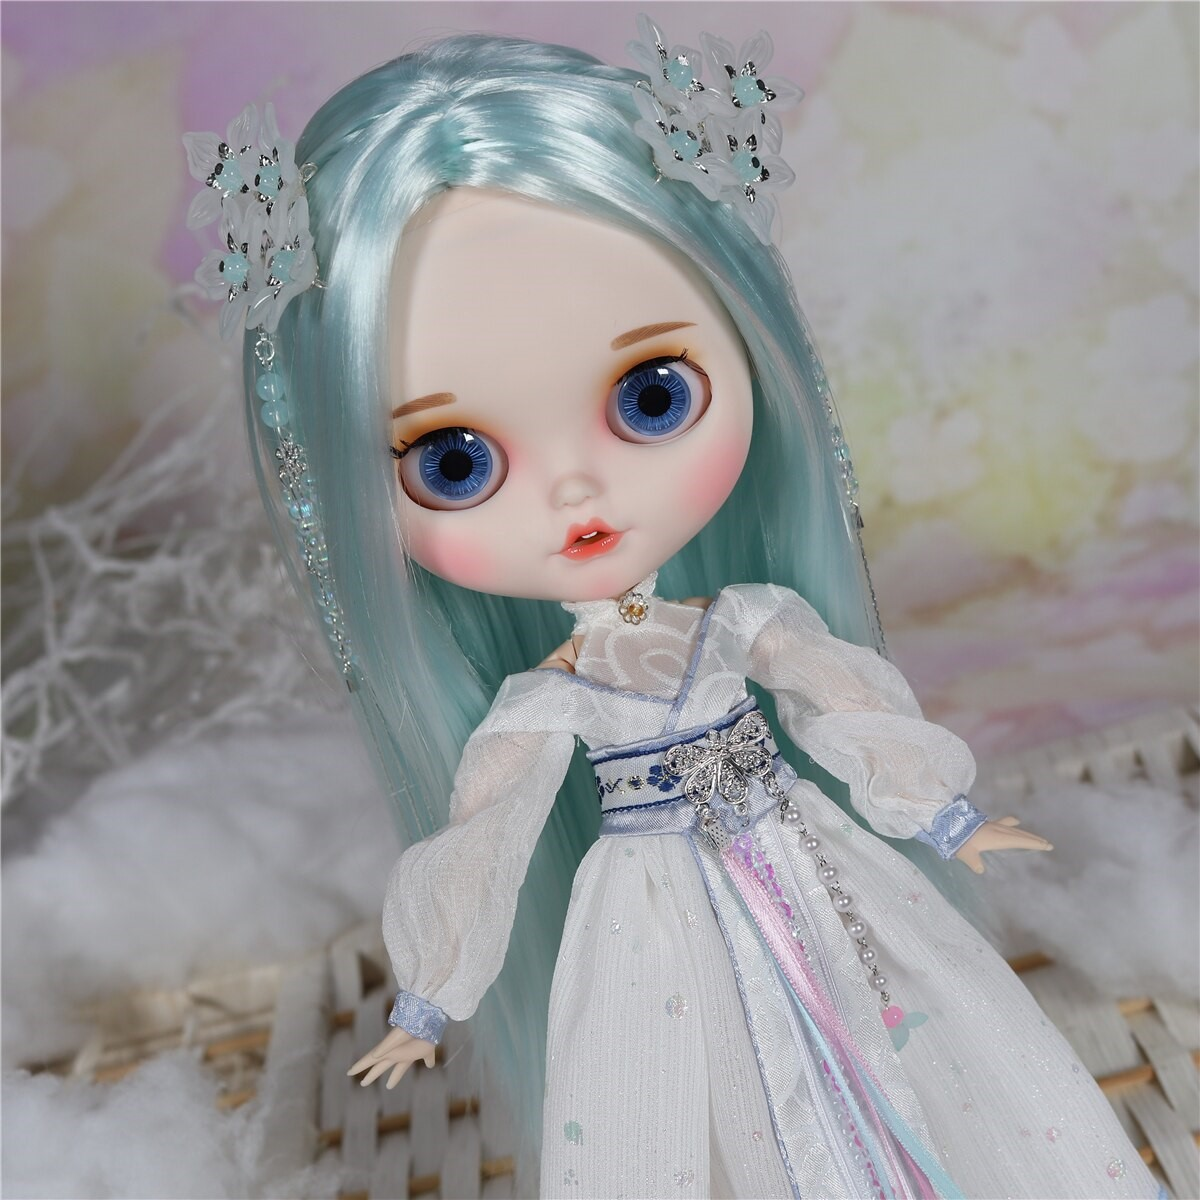 Lena – Premium Custom Blythe Doll with Clothes Smiling Face Premium Blythe Dolls 🆕 Smiling Face